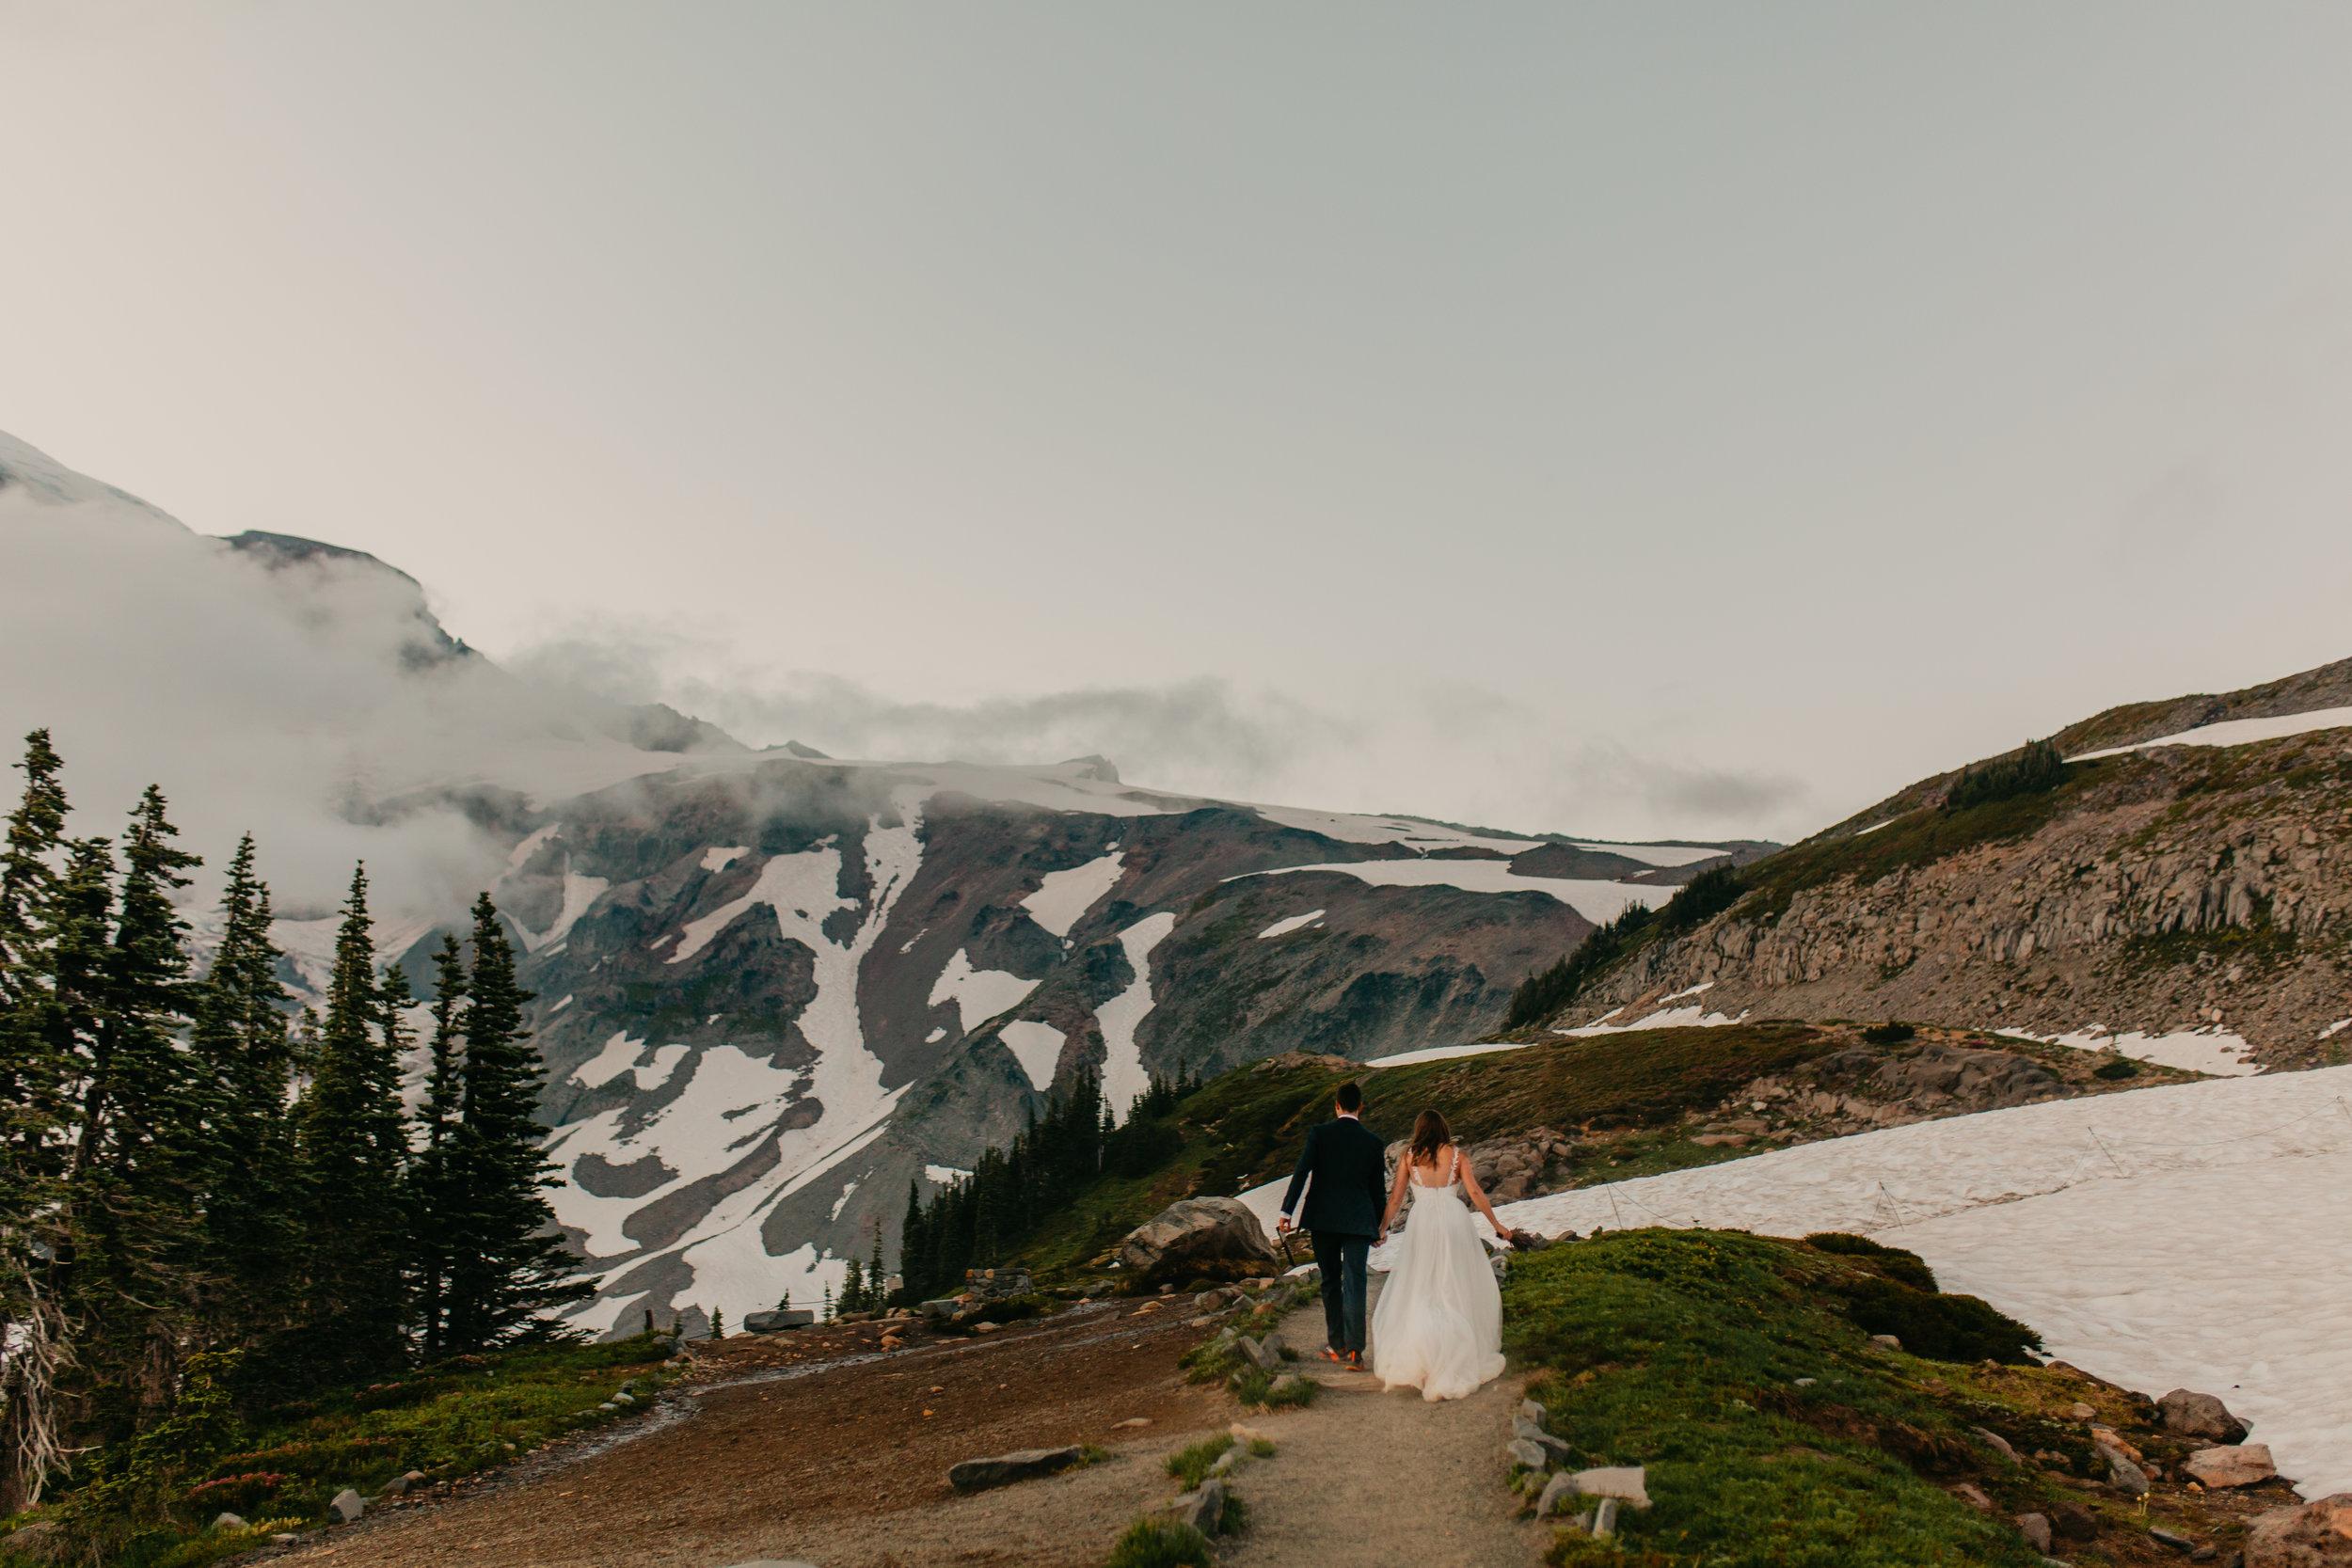 Nicole-Daacke-Photography-Mt-Rainier-elopement-photographer-washington-mountain-epic-wedding-photography-wildflowers-at-rainier-pine-tree-cloudy-summer-day-at-mountain-rainier-71.jpg